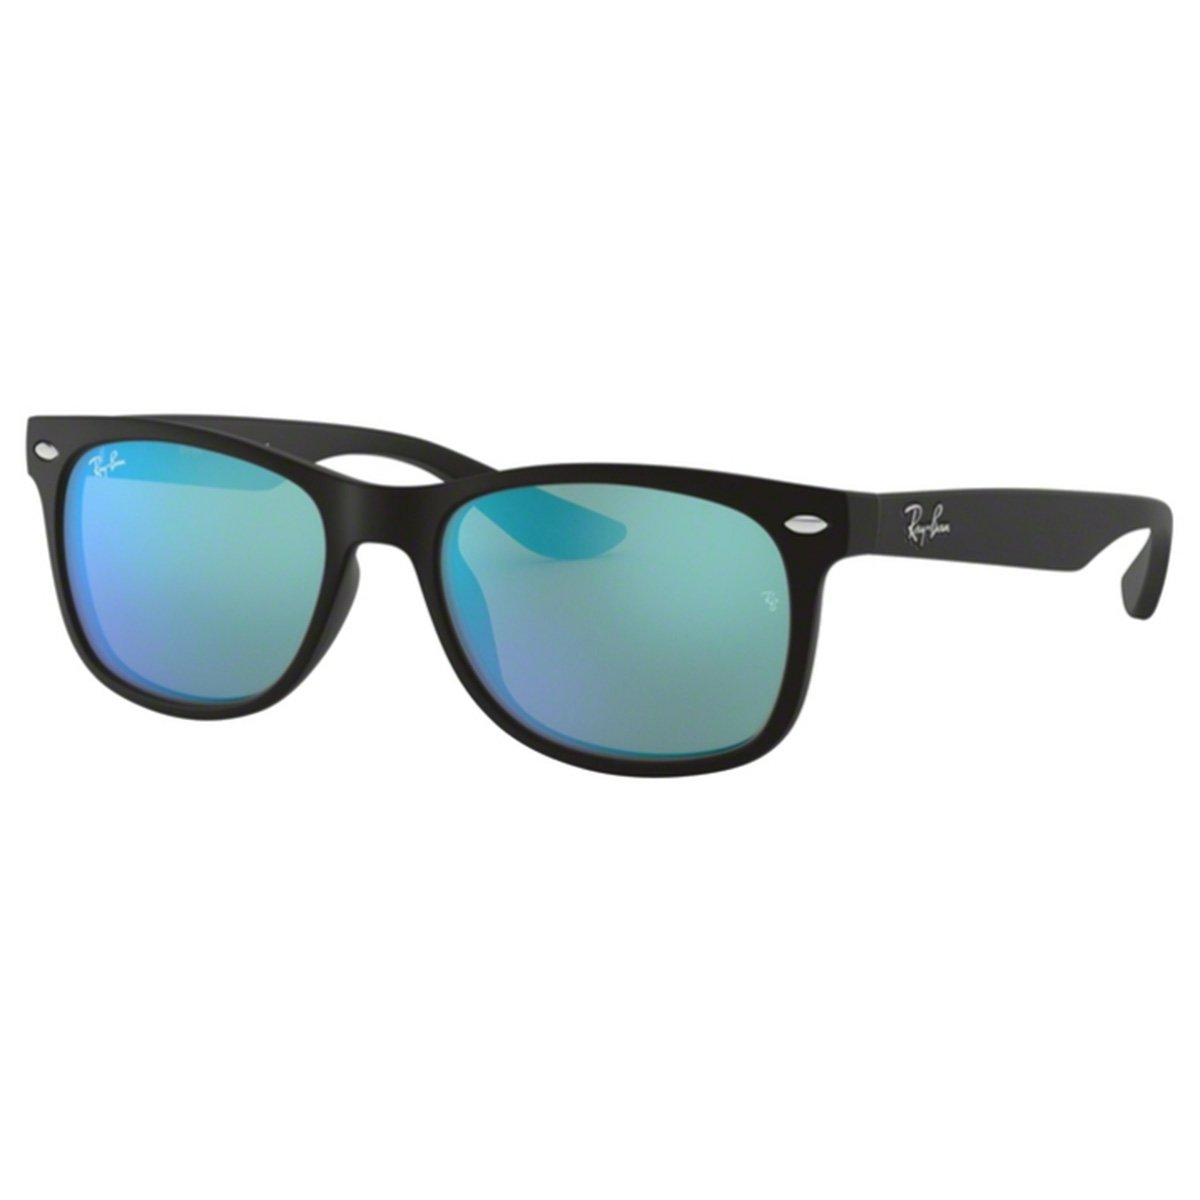 4ef02ef73 Compre Óculos de Sol Ray Ban New Wayfarer Infantil em 10X